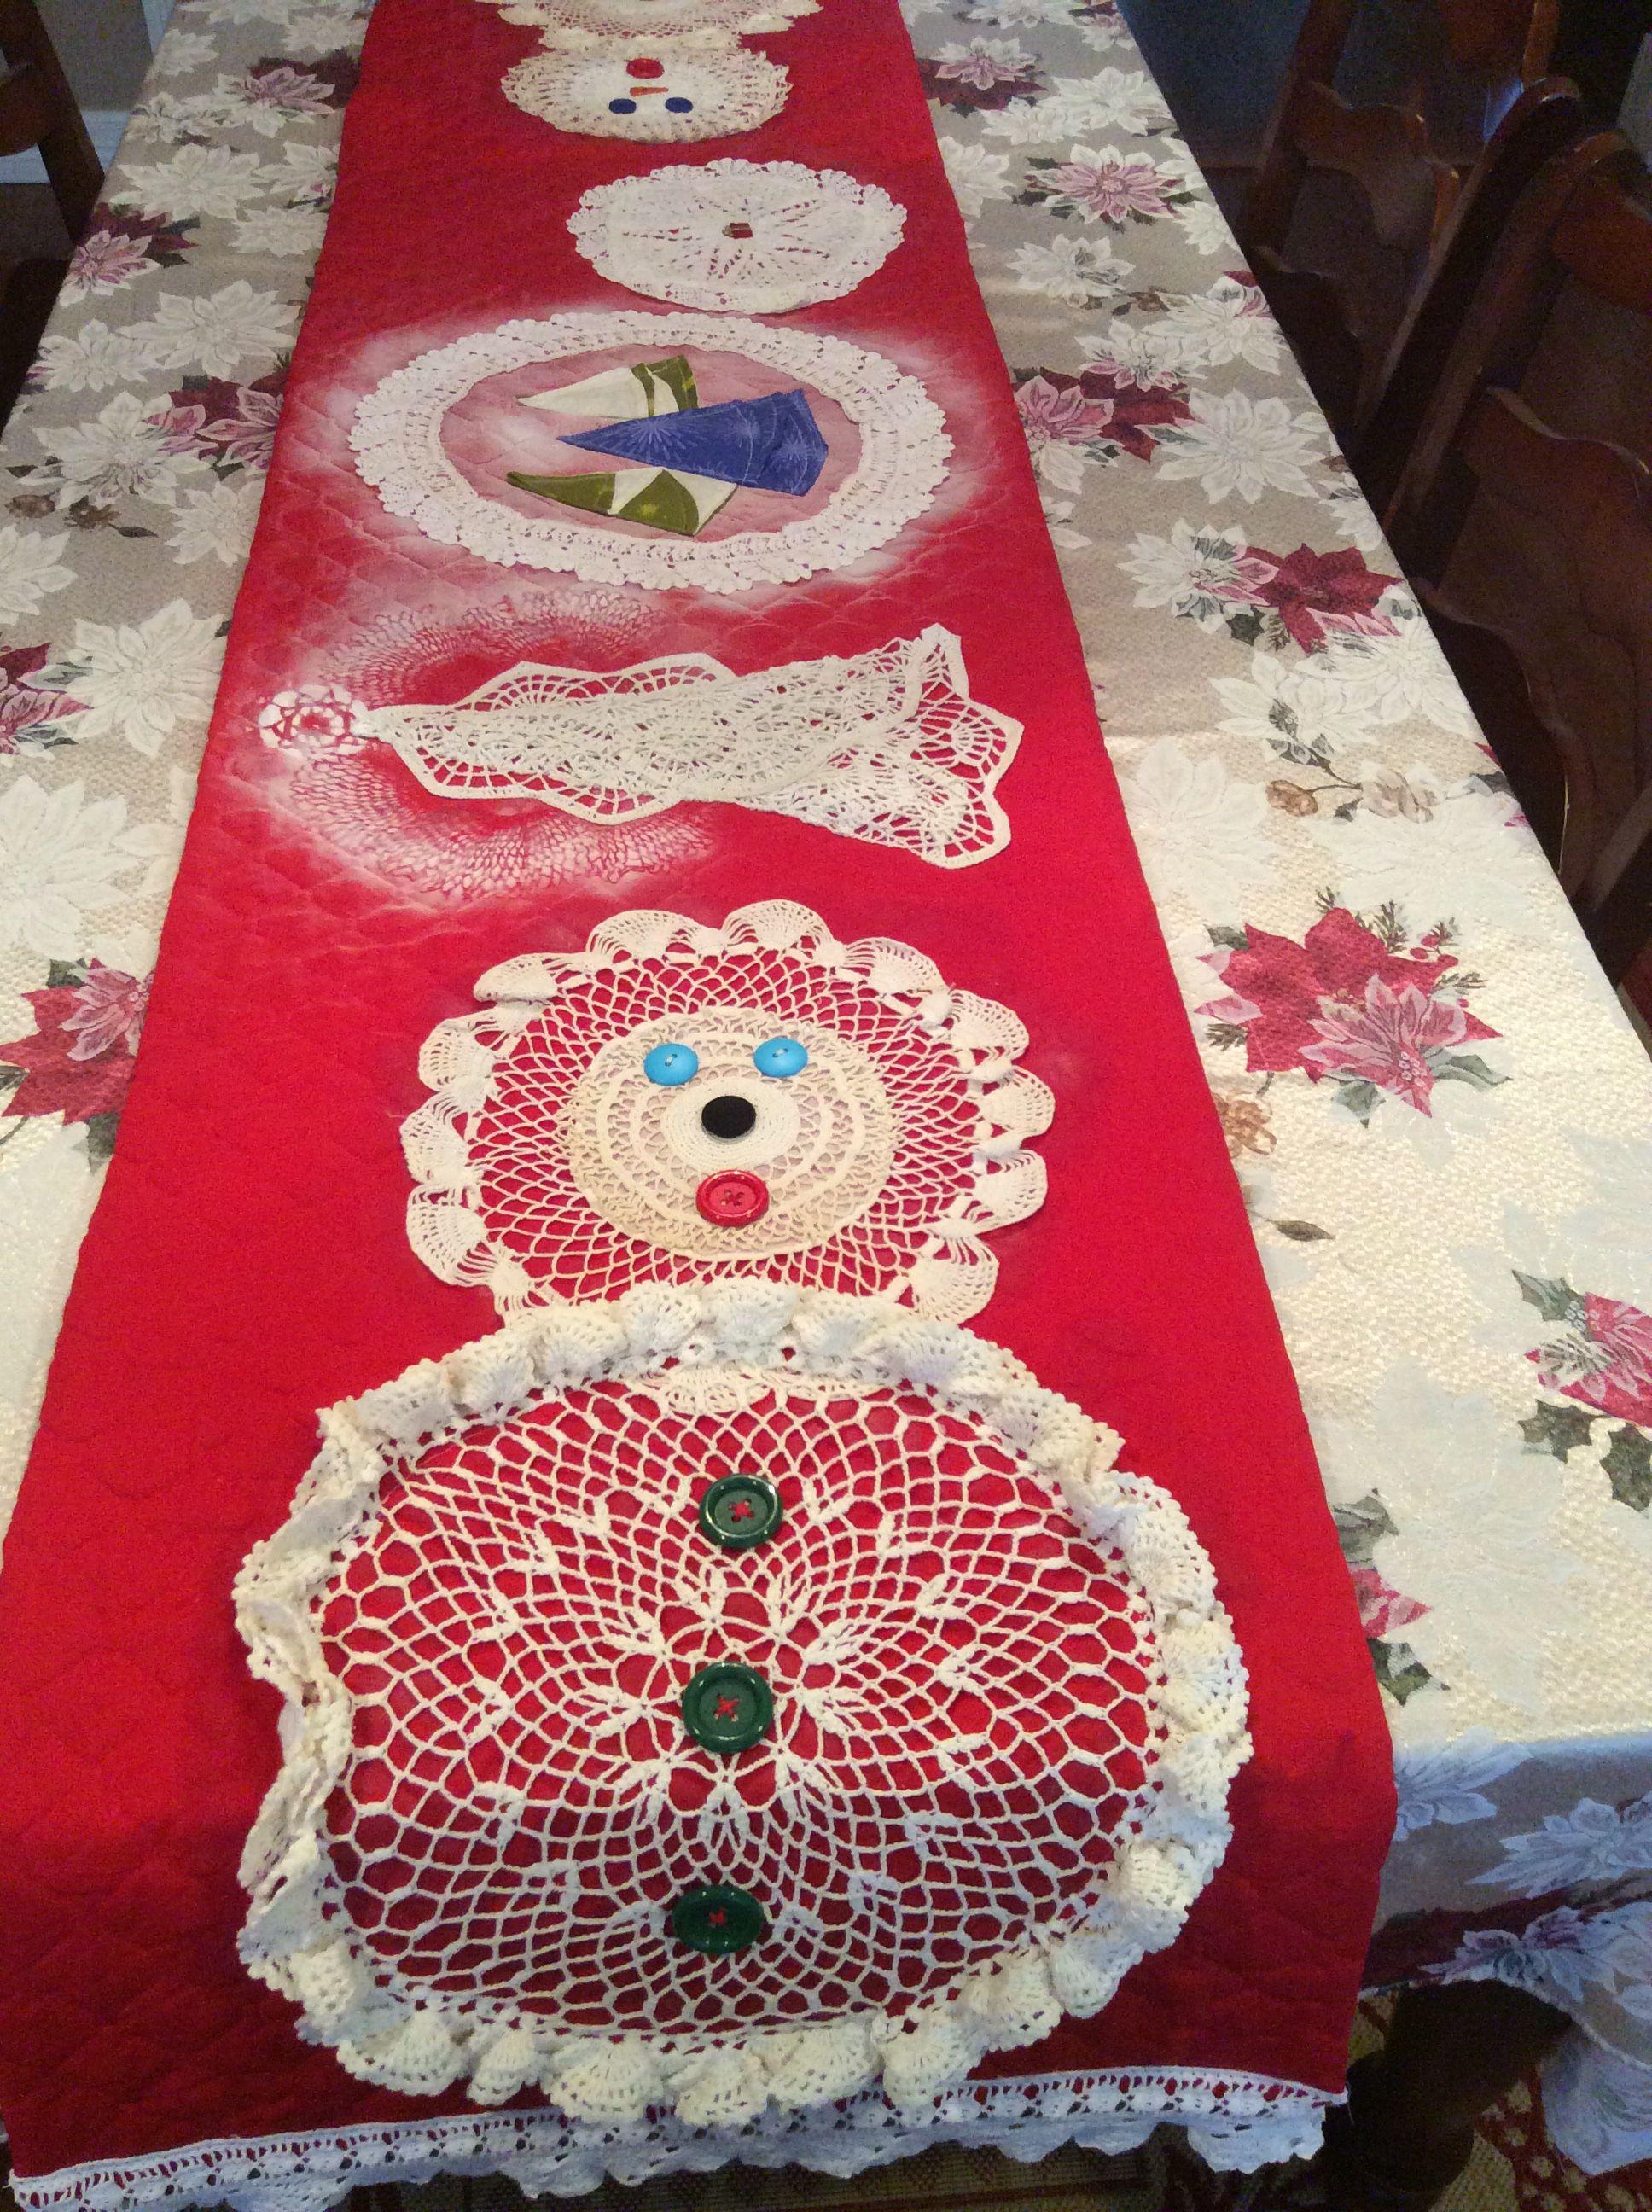 Repurposing doilies to make a Christmas table runner.